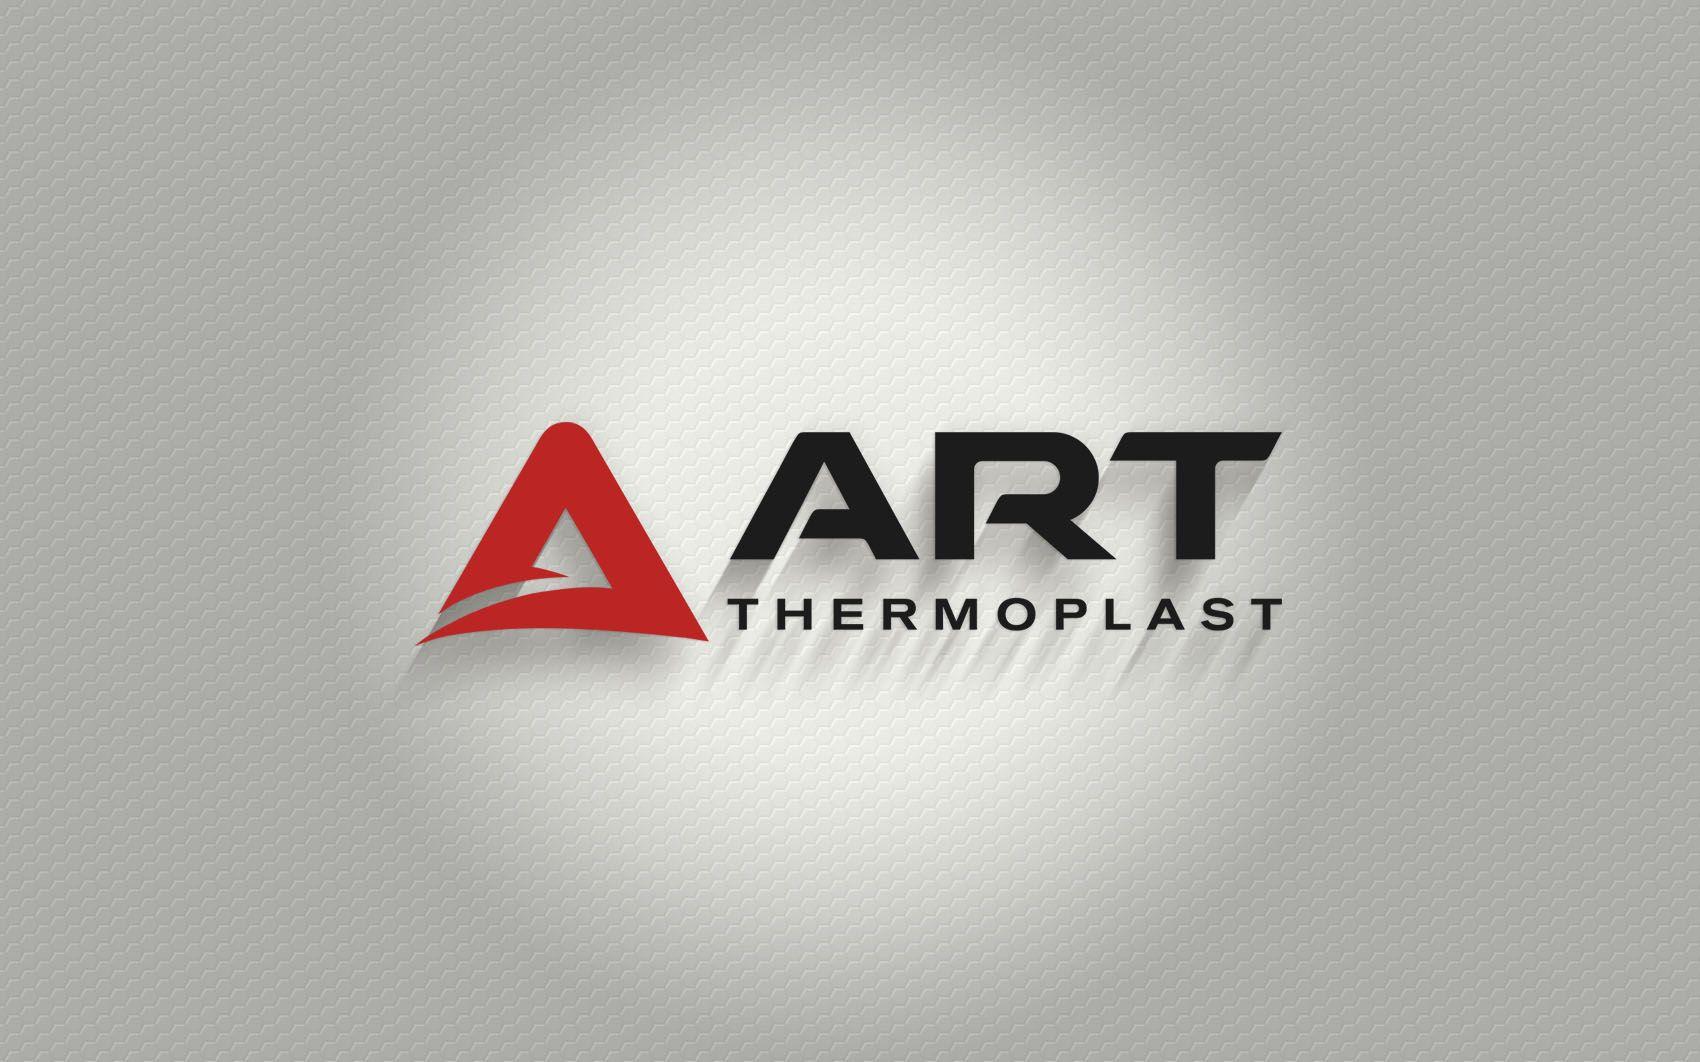 Art Thermoplast Logo Design By Xovak Studio - A great logo that ...